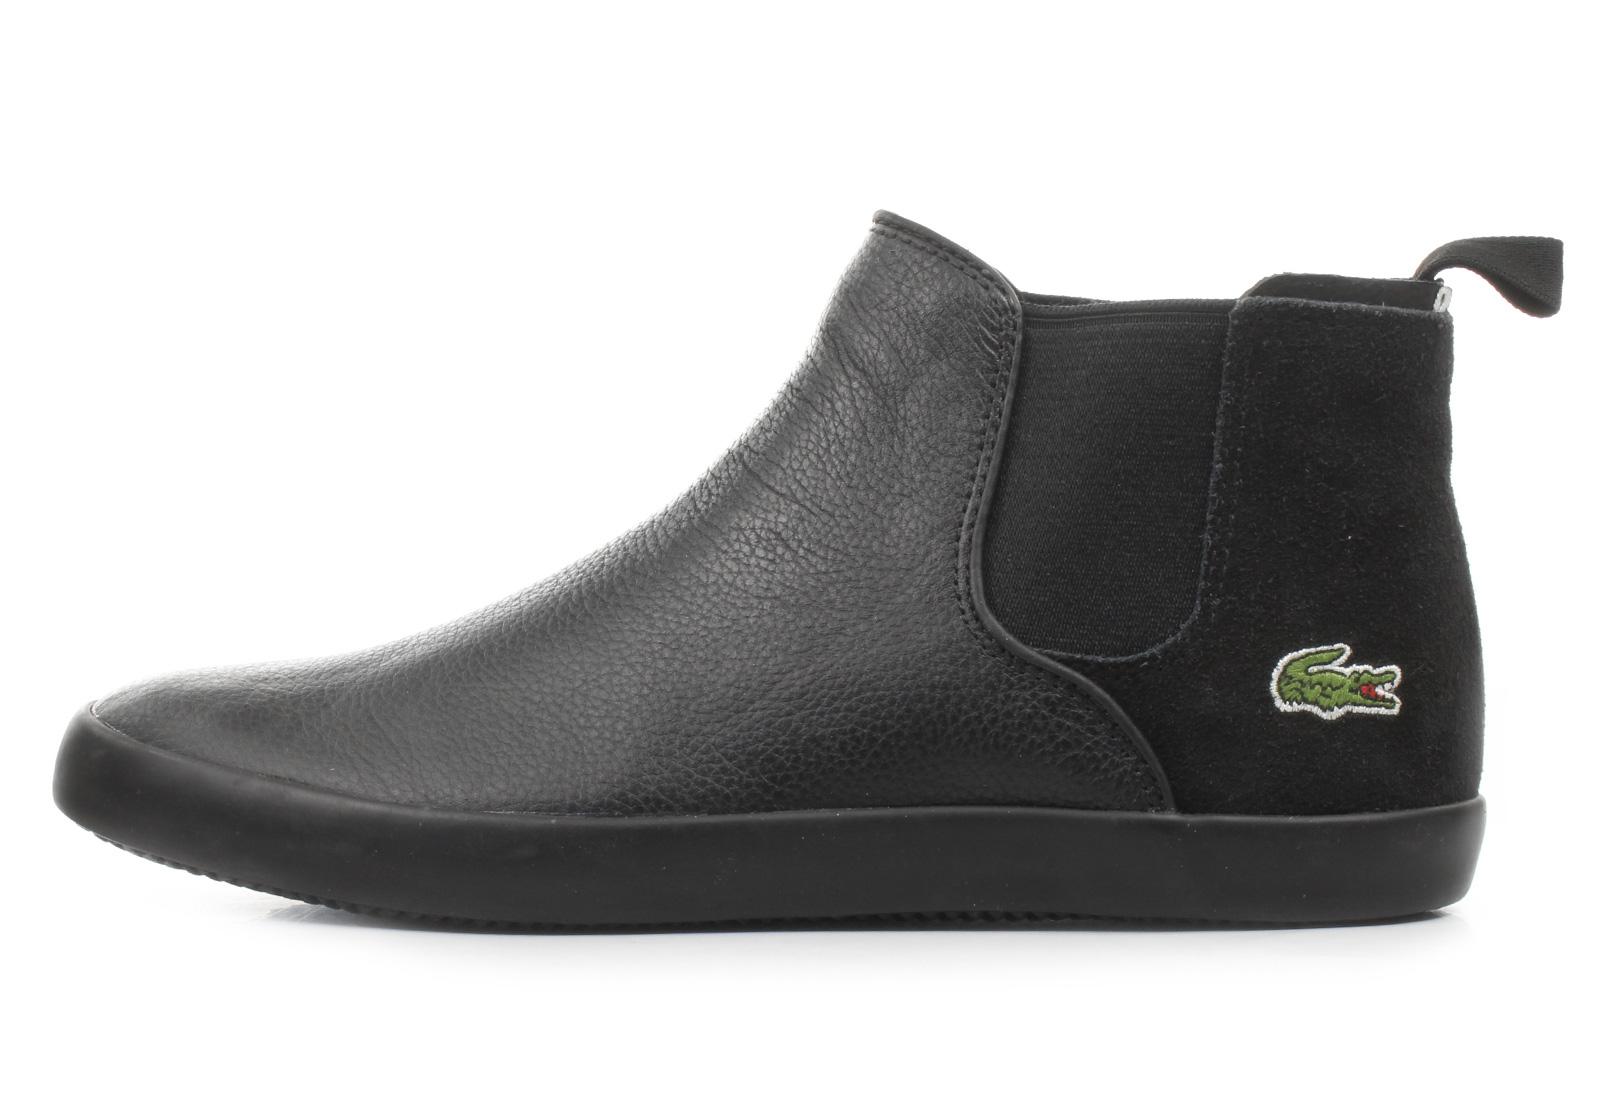 nowy haj niesamowity wybór całkiem miło Lacoste Boots - Ziane Chelsea - 153spw0022-237 - Online shop for sneakers,  shoes and boots